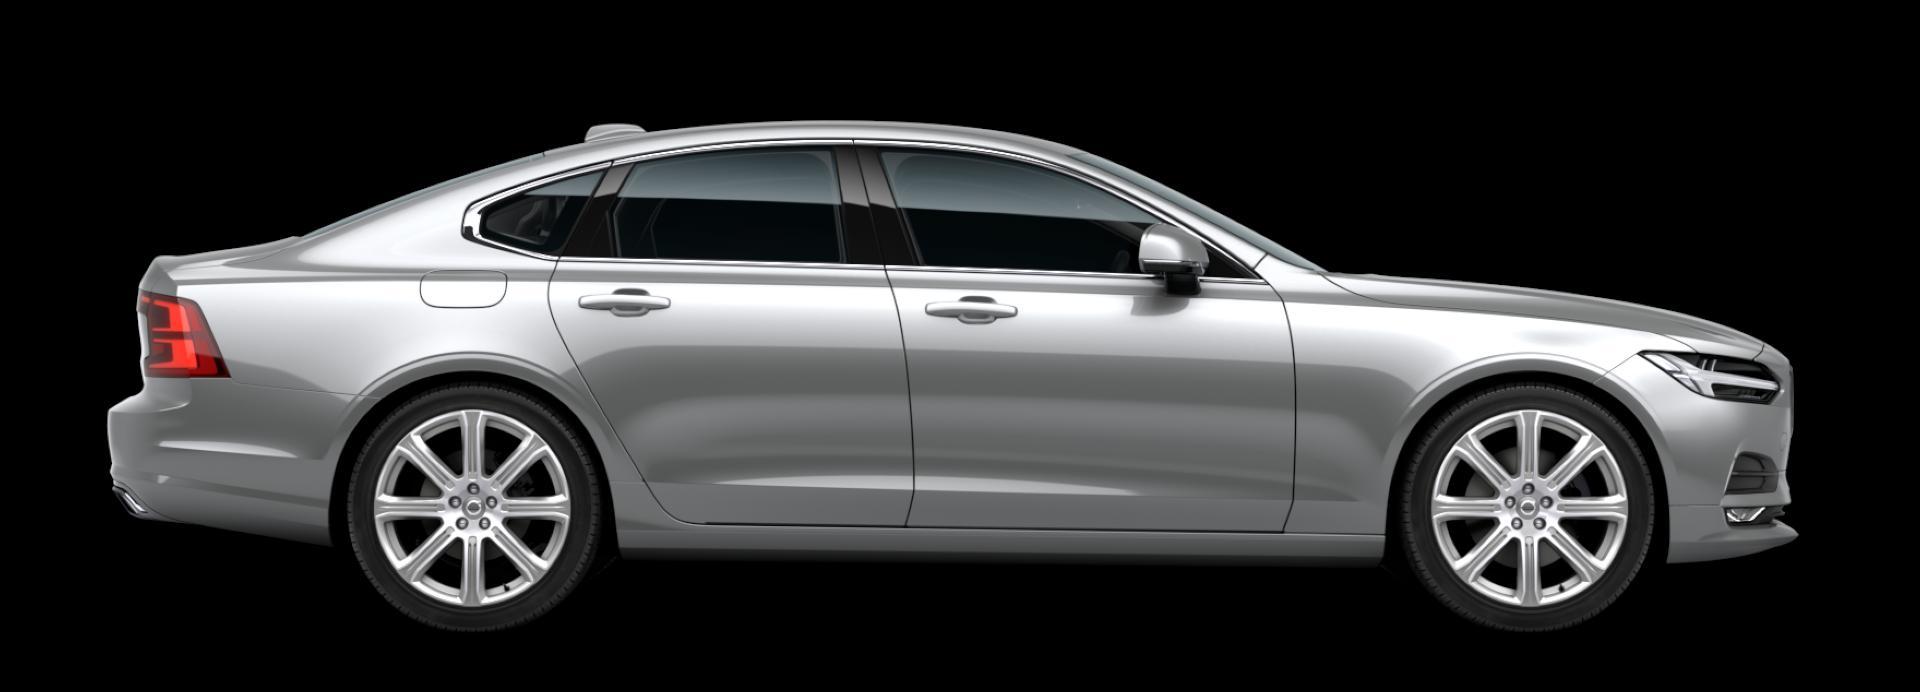 Fiyat Listesi Arkas Otomotiv Volvo Yetkili Saticisi Ankara Siteler Yenimahalle